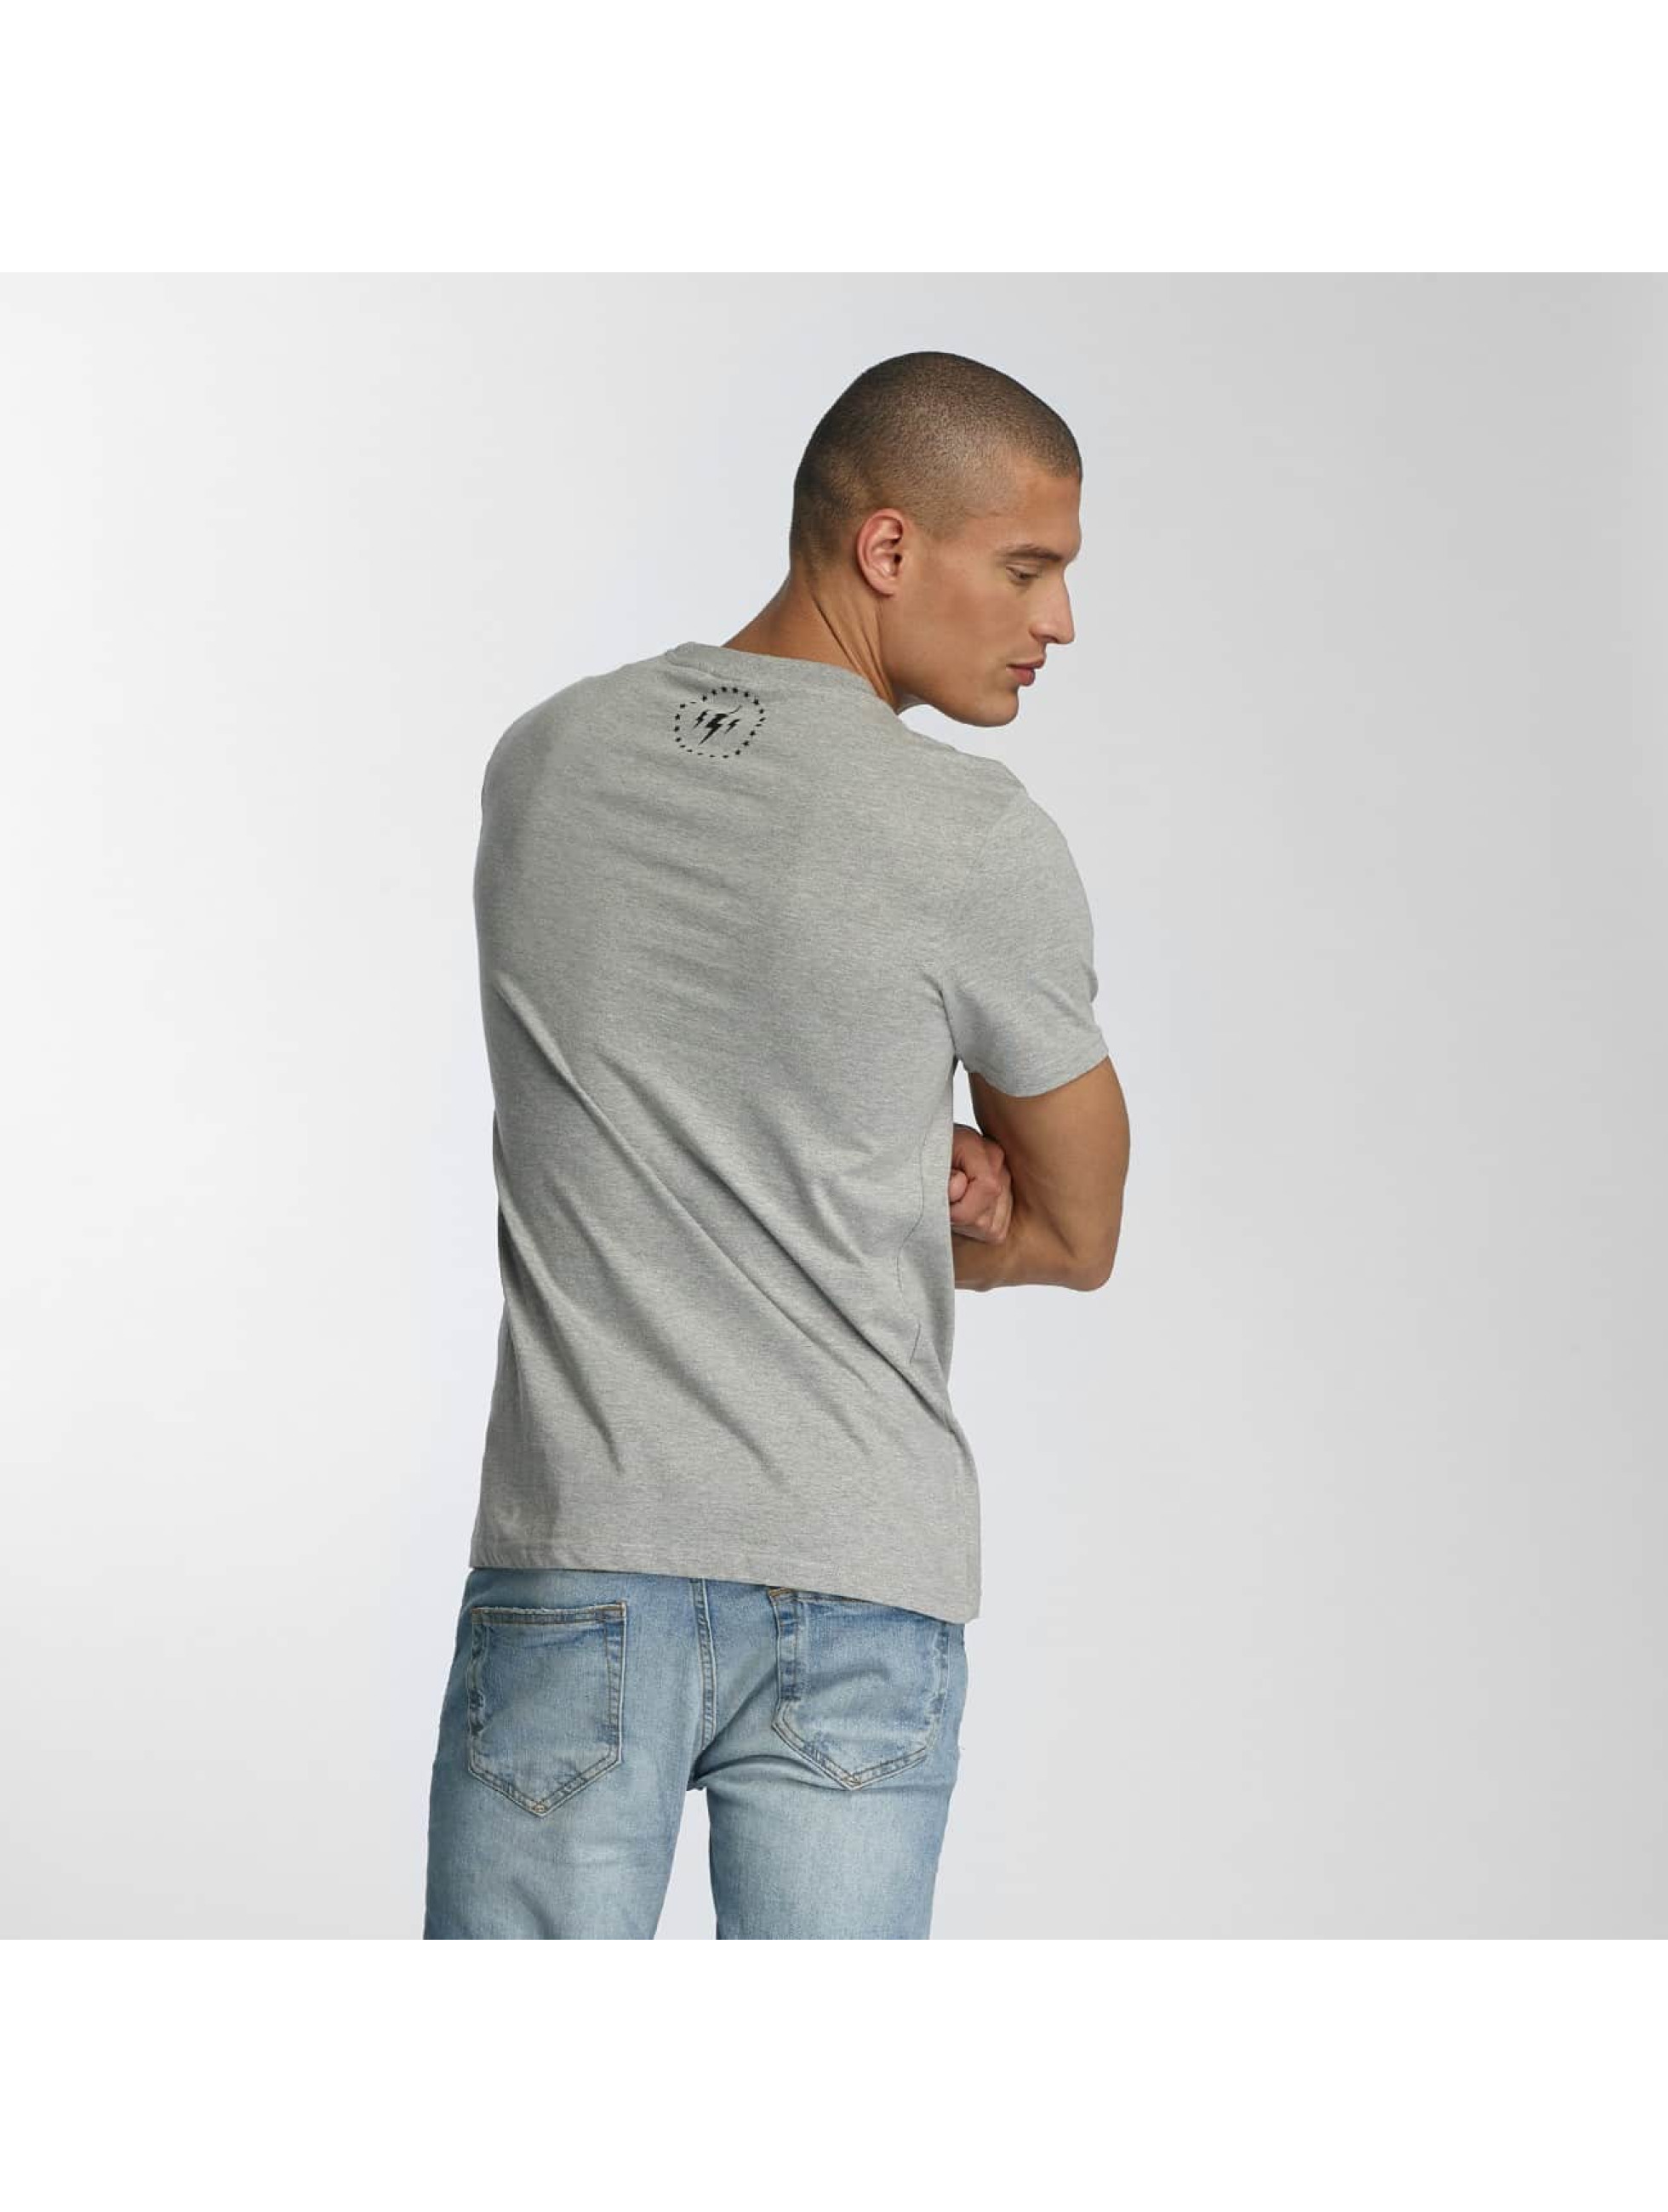 TrueSpin t-shirt 7 grijs